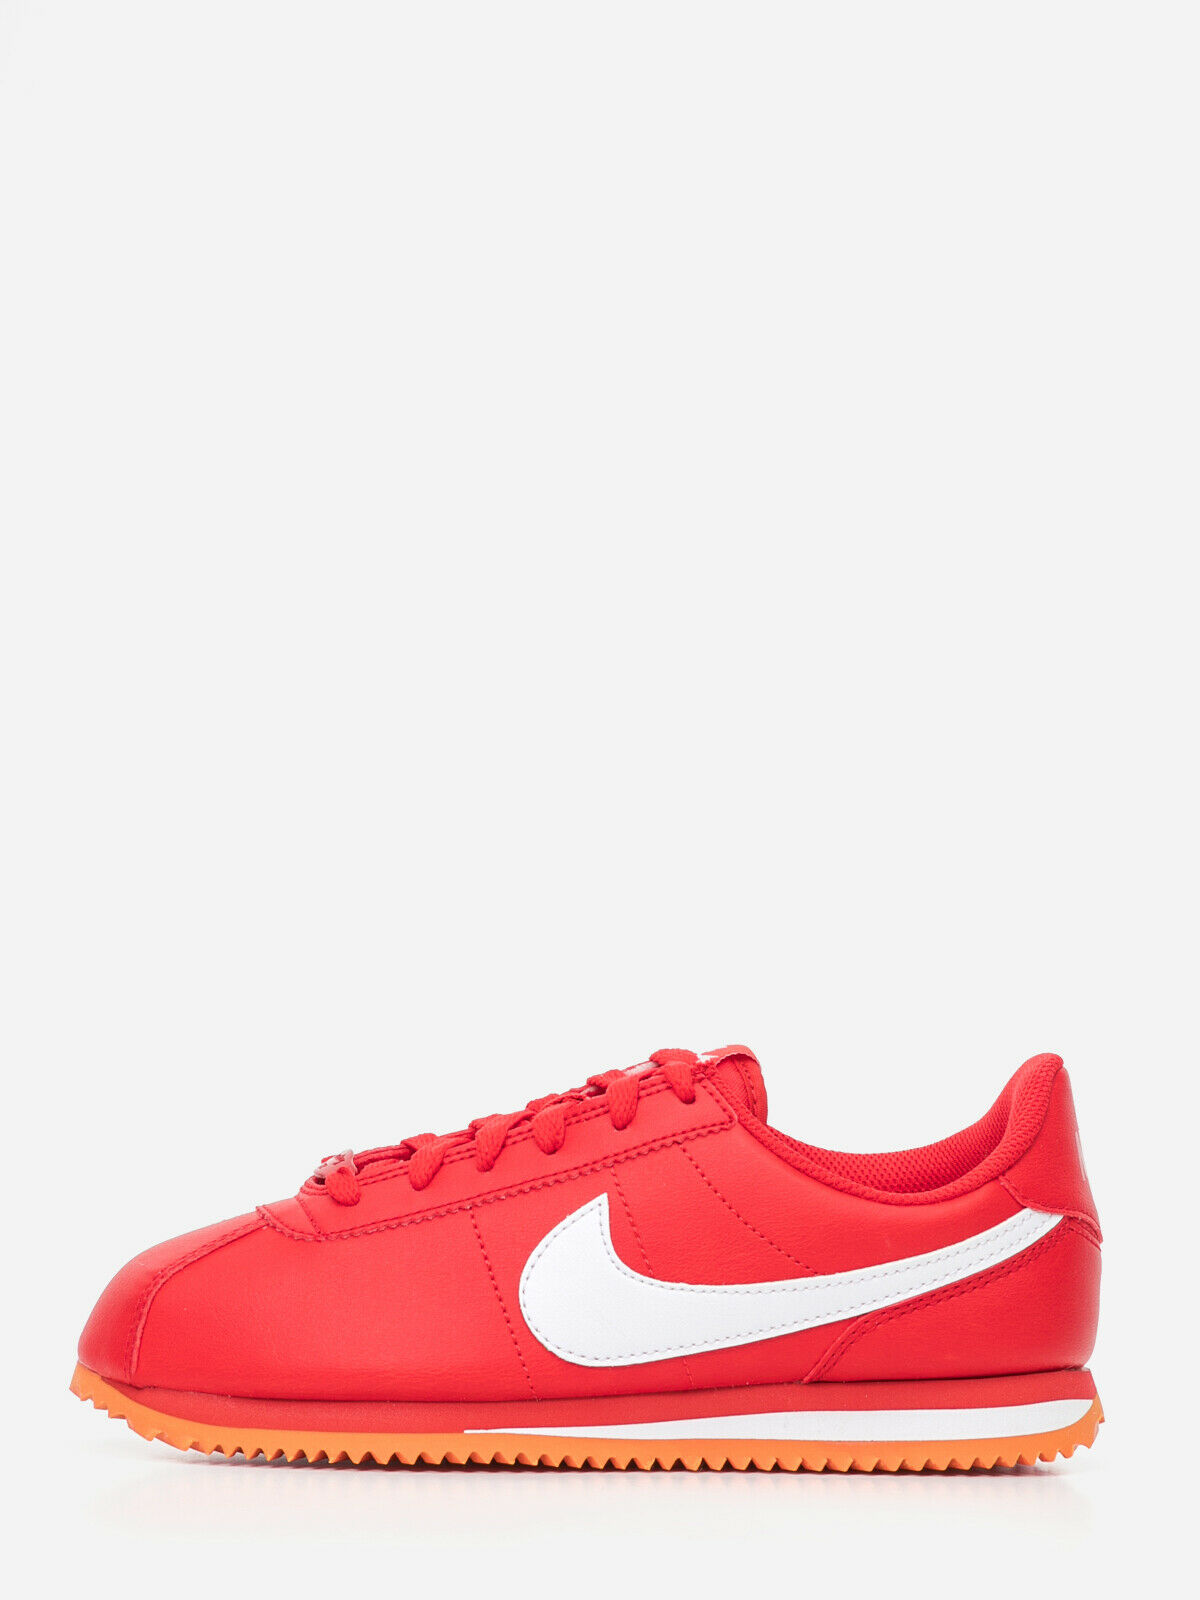 Unisex Nike Cortez Basic Sl GS Turnschuhe Schuhe Rot Weiß 904764 601 UK 5 _ 5.5